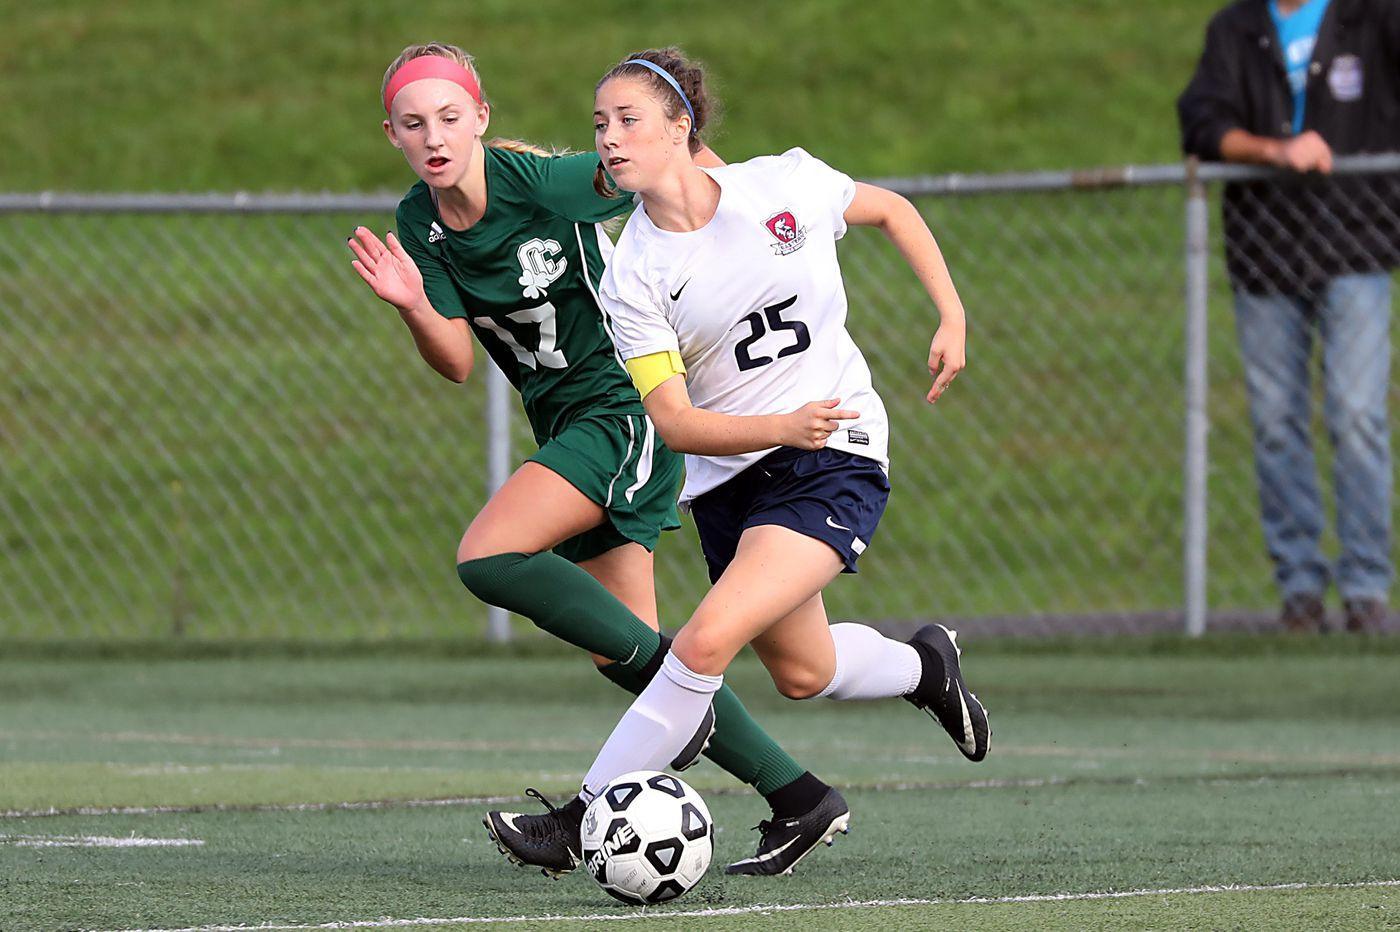 Sara Brocious helps make Eastern a girls' soccer powerhouse